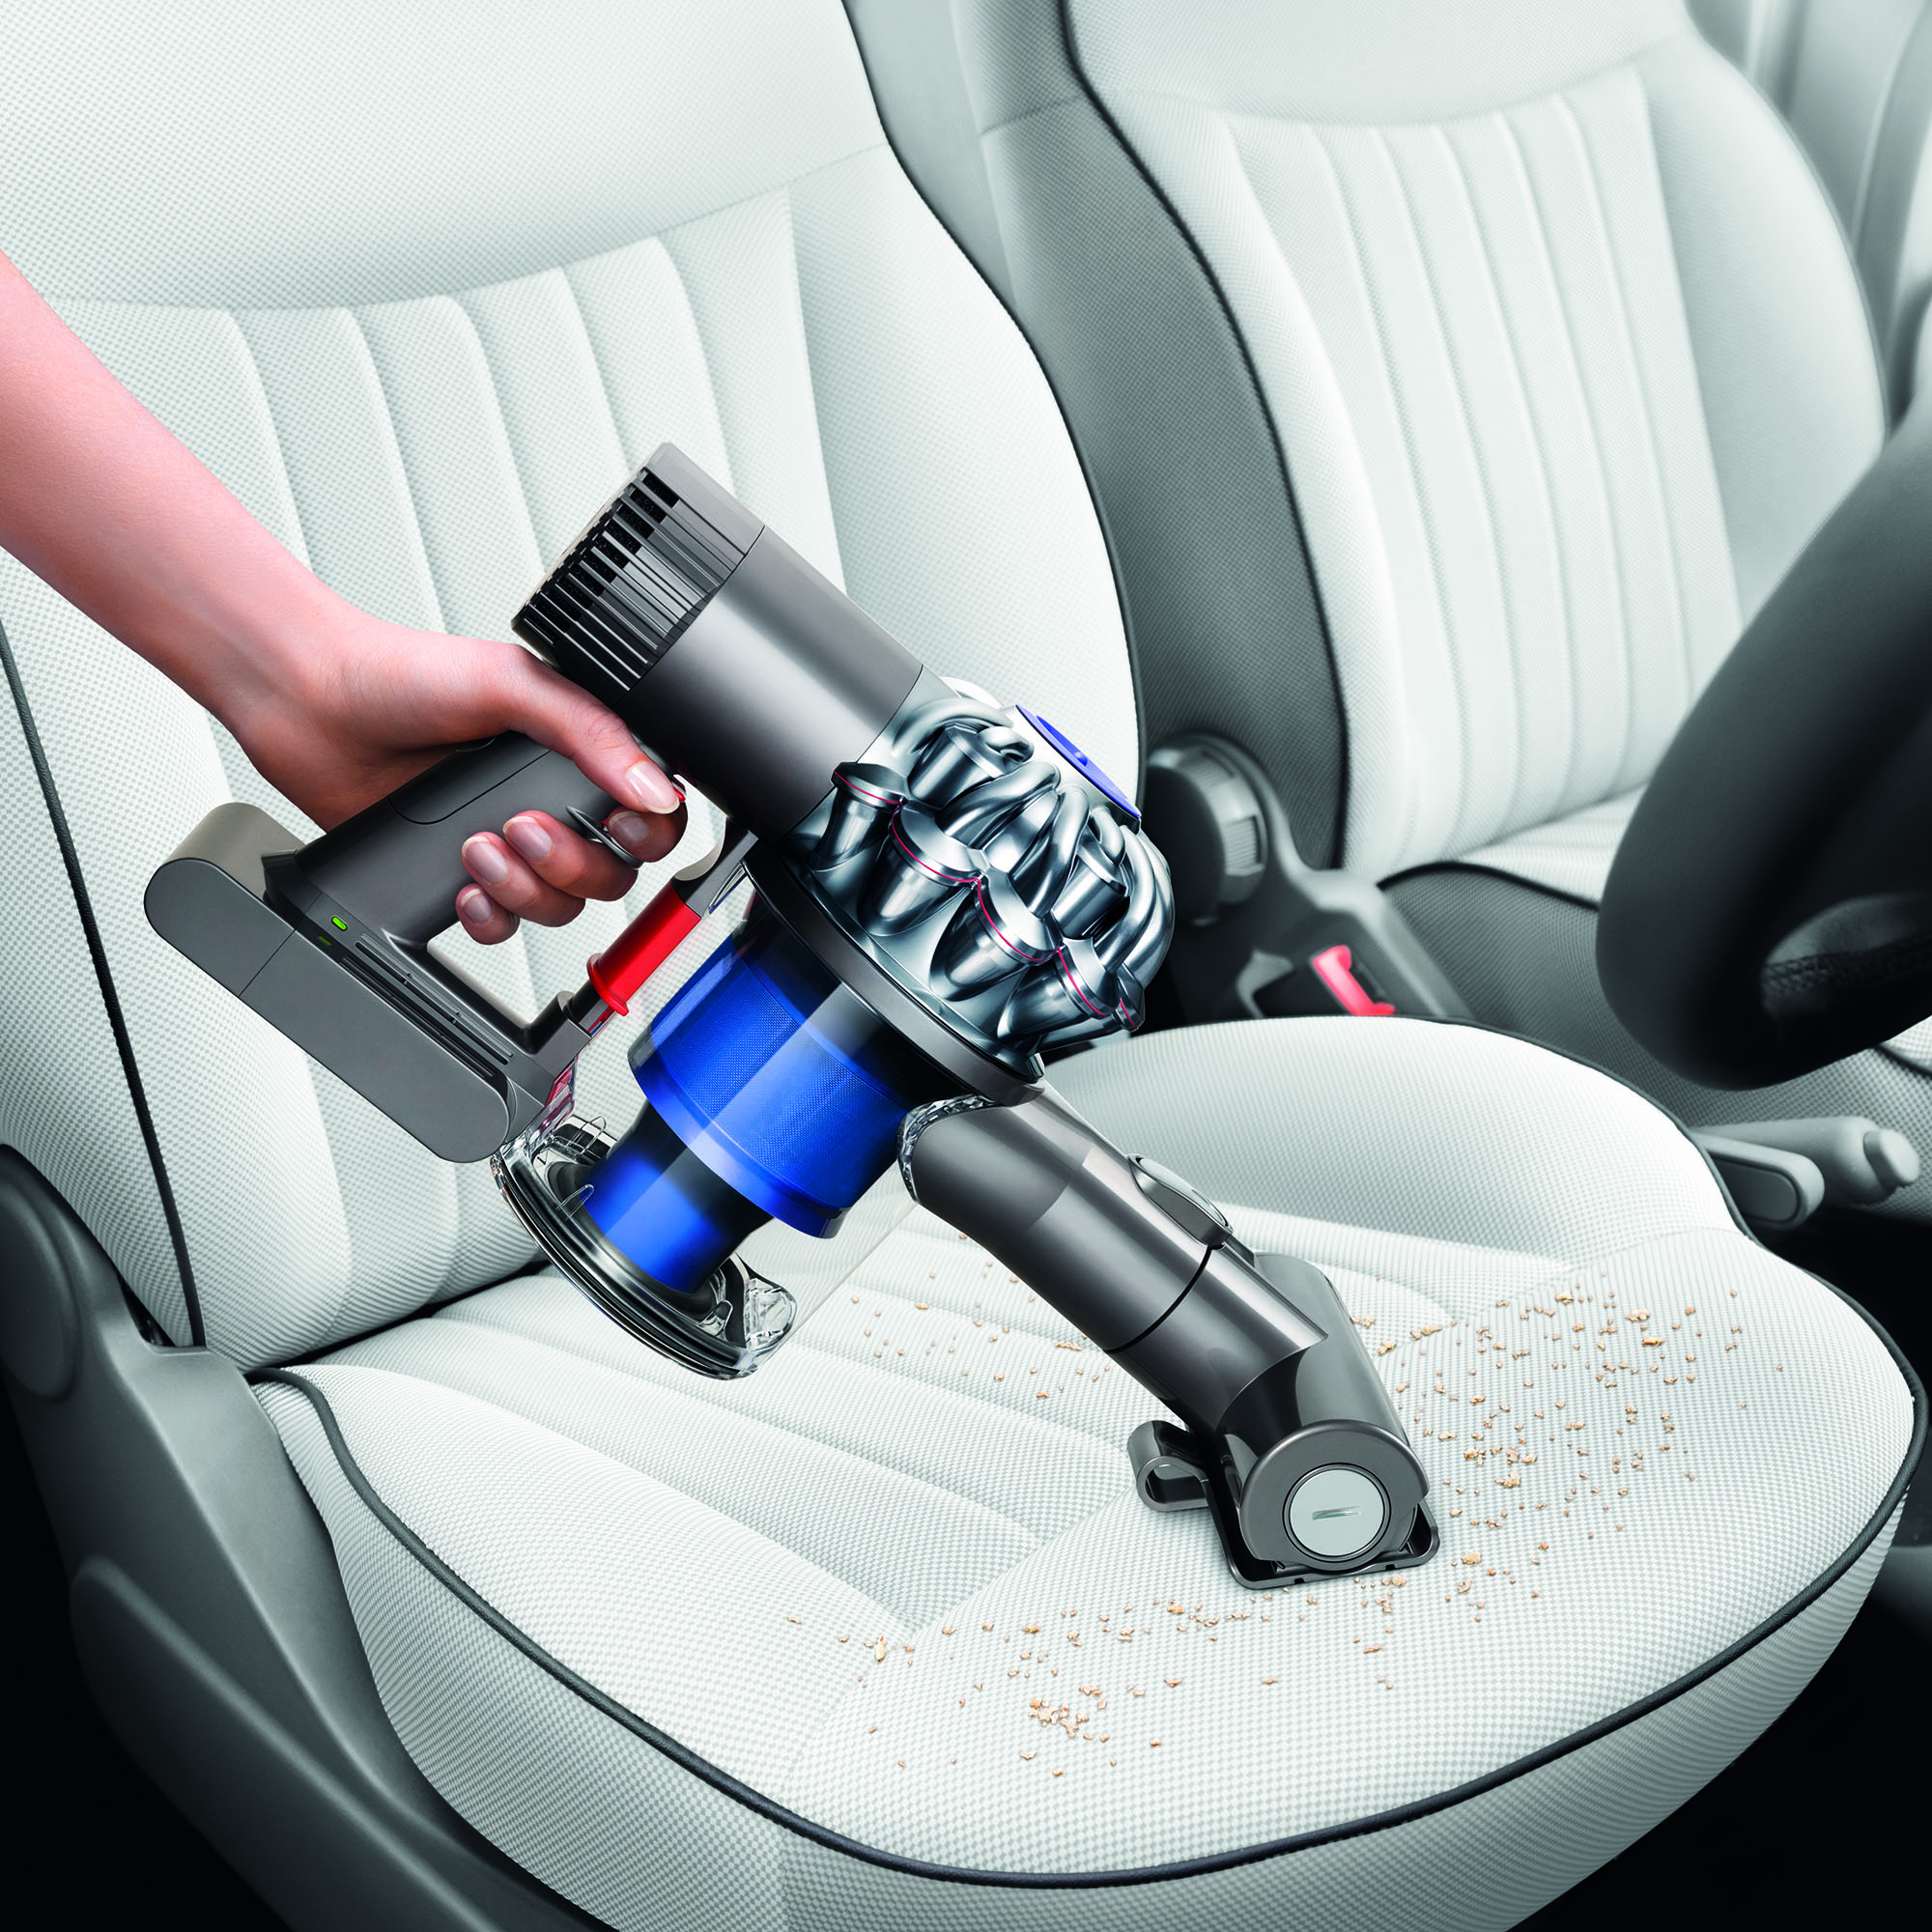 Dyson-V6-Trigger-Max-Handheld-Vacuum-Refurbished